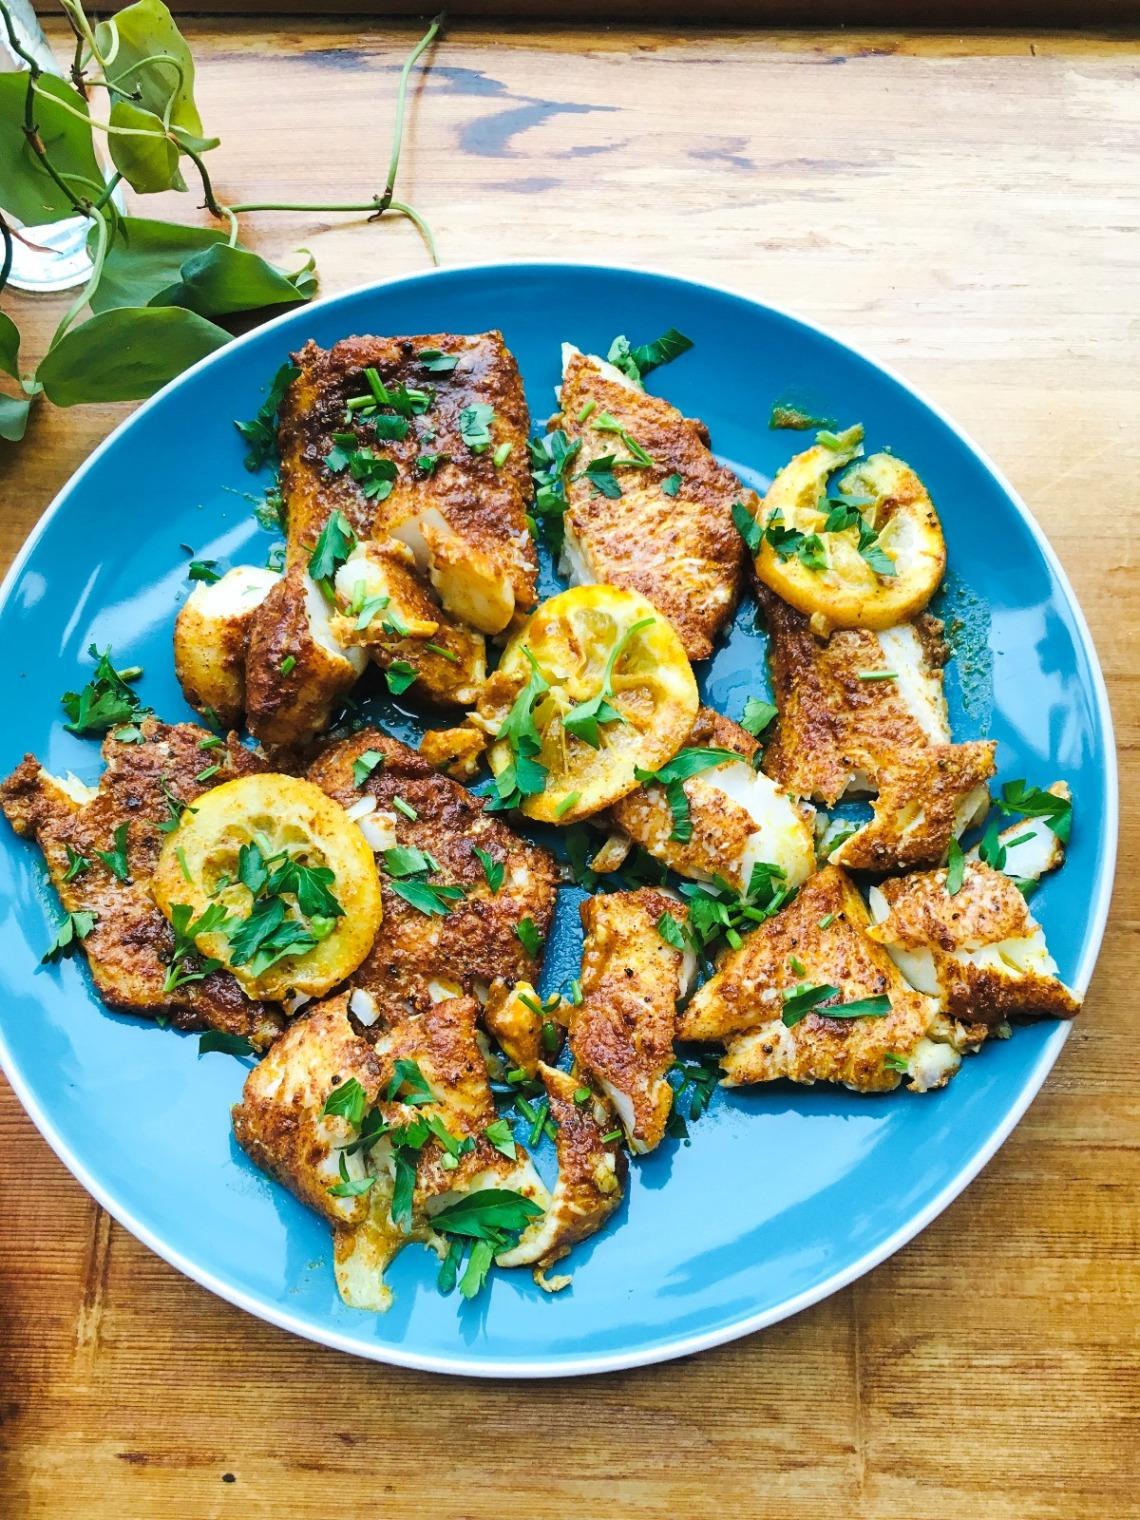 shawarma spiced cod with fresh parsley and lemon